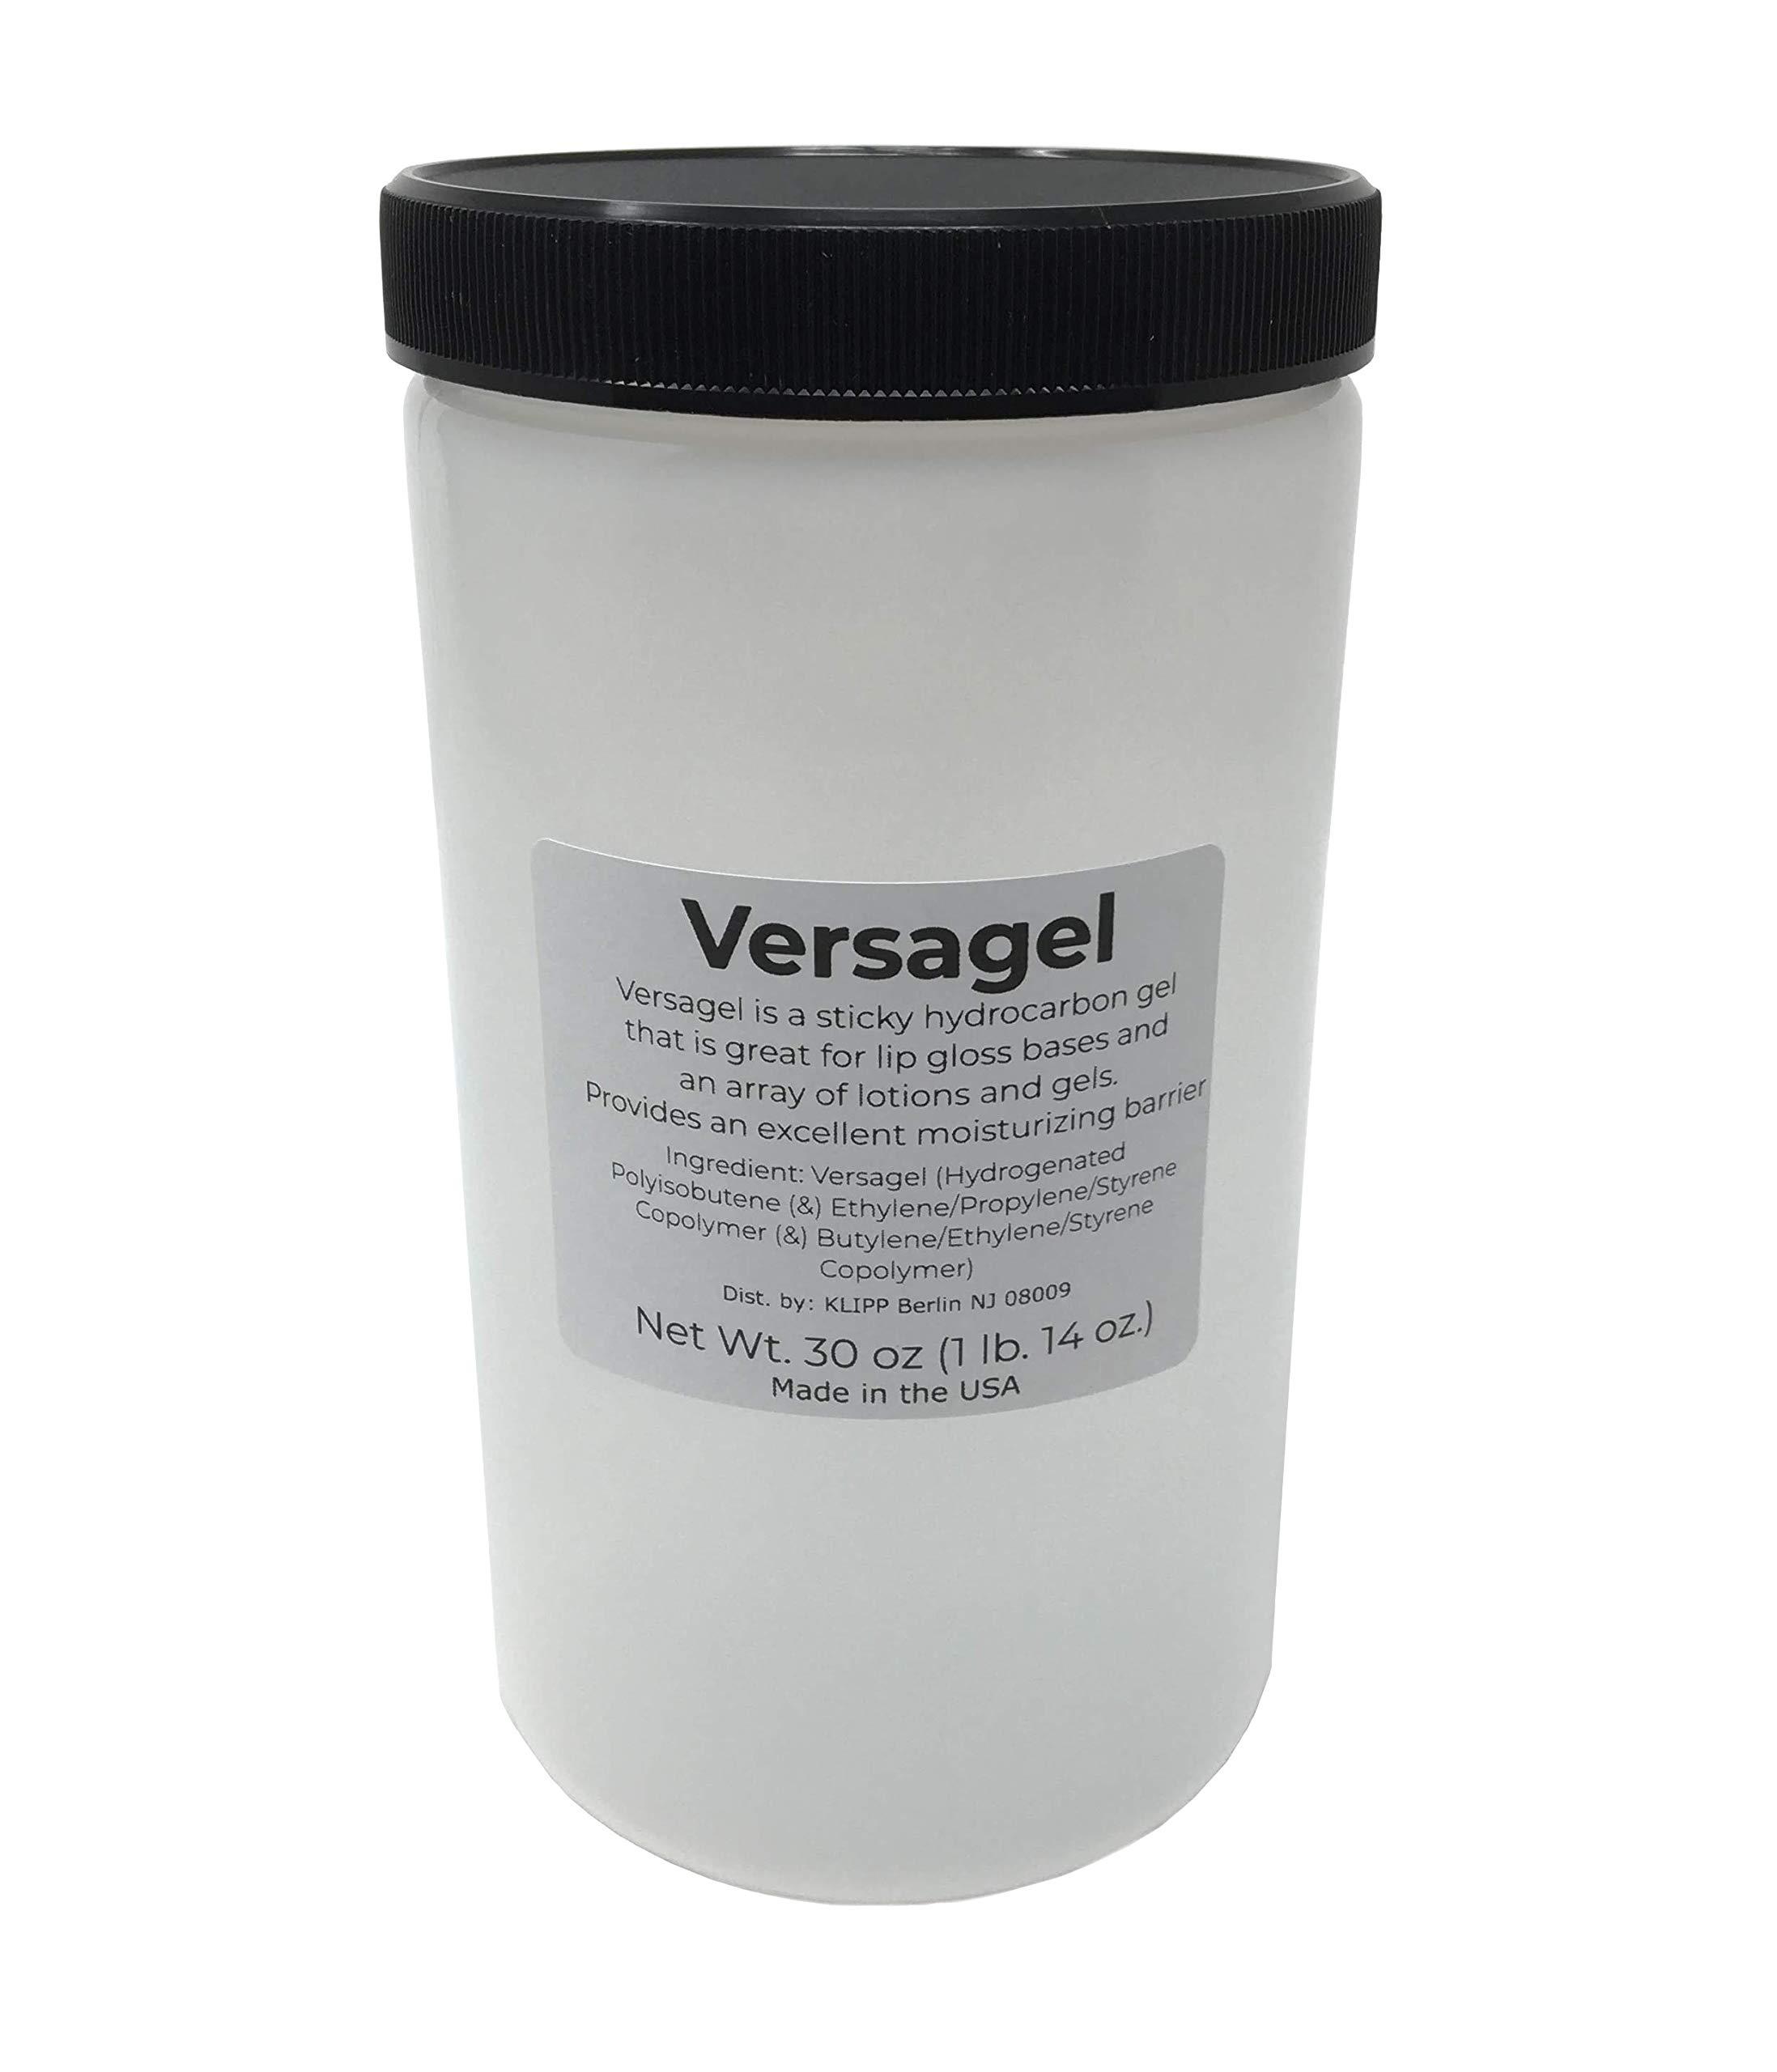 Versagel Lip Gloss Base (30 ounce (1lb 14oz) jar)